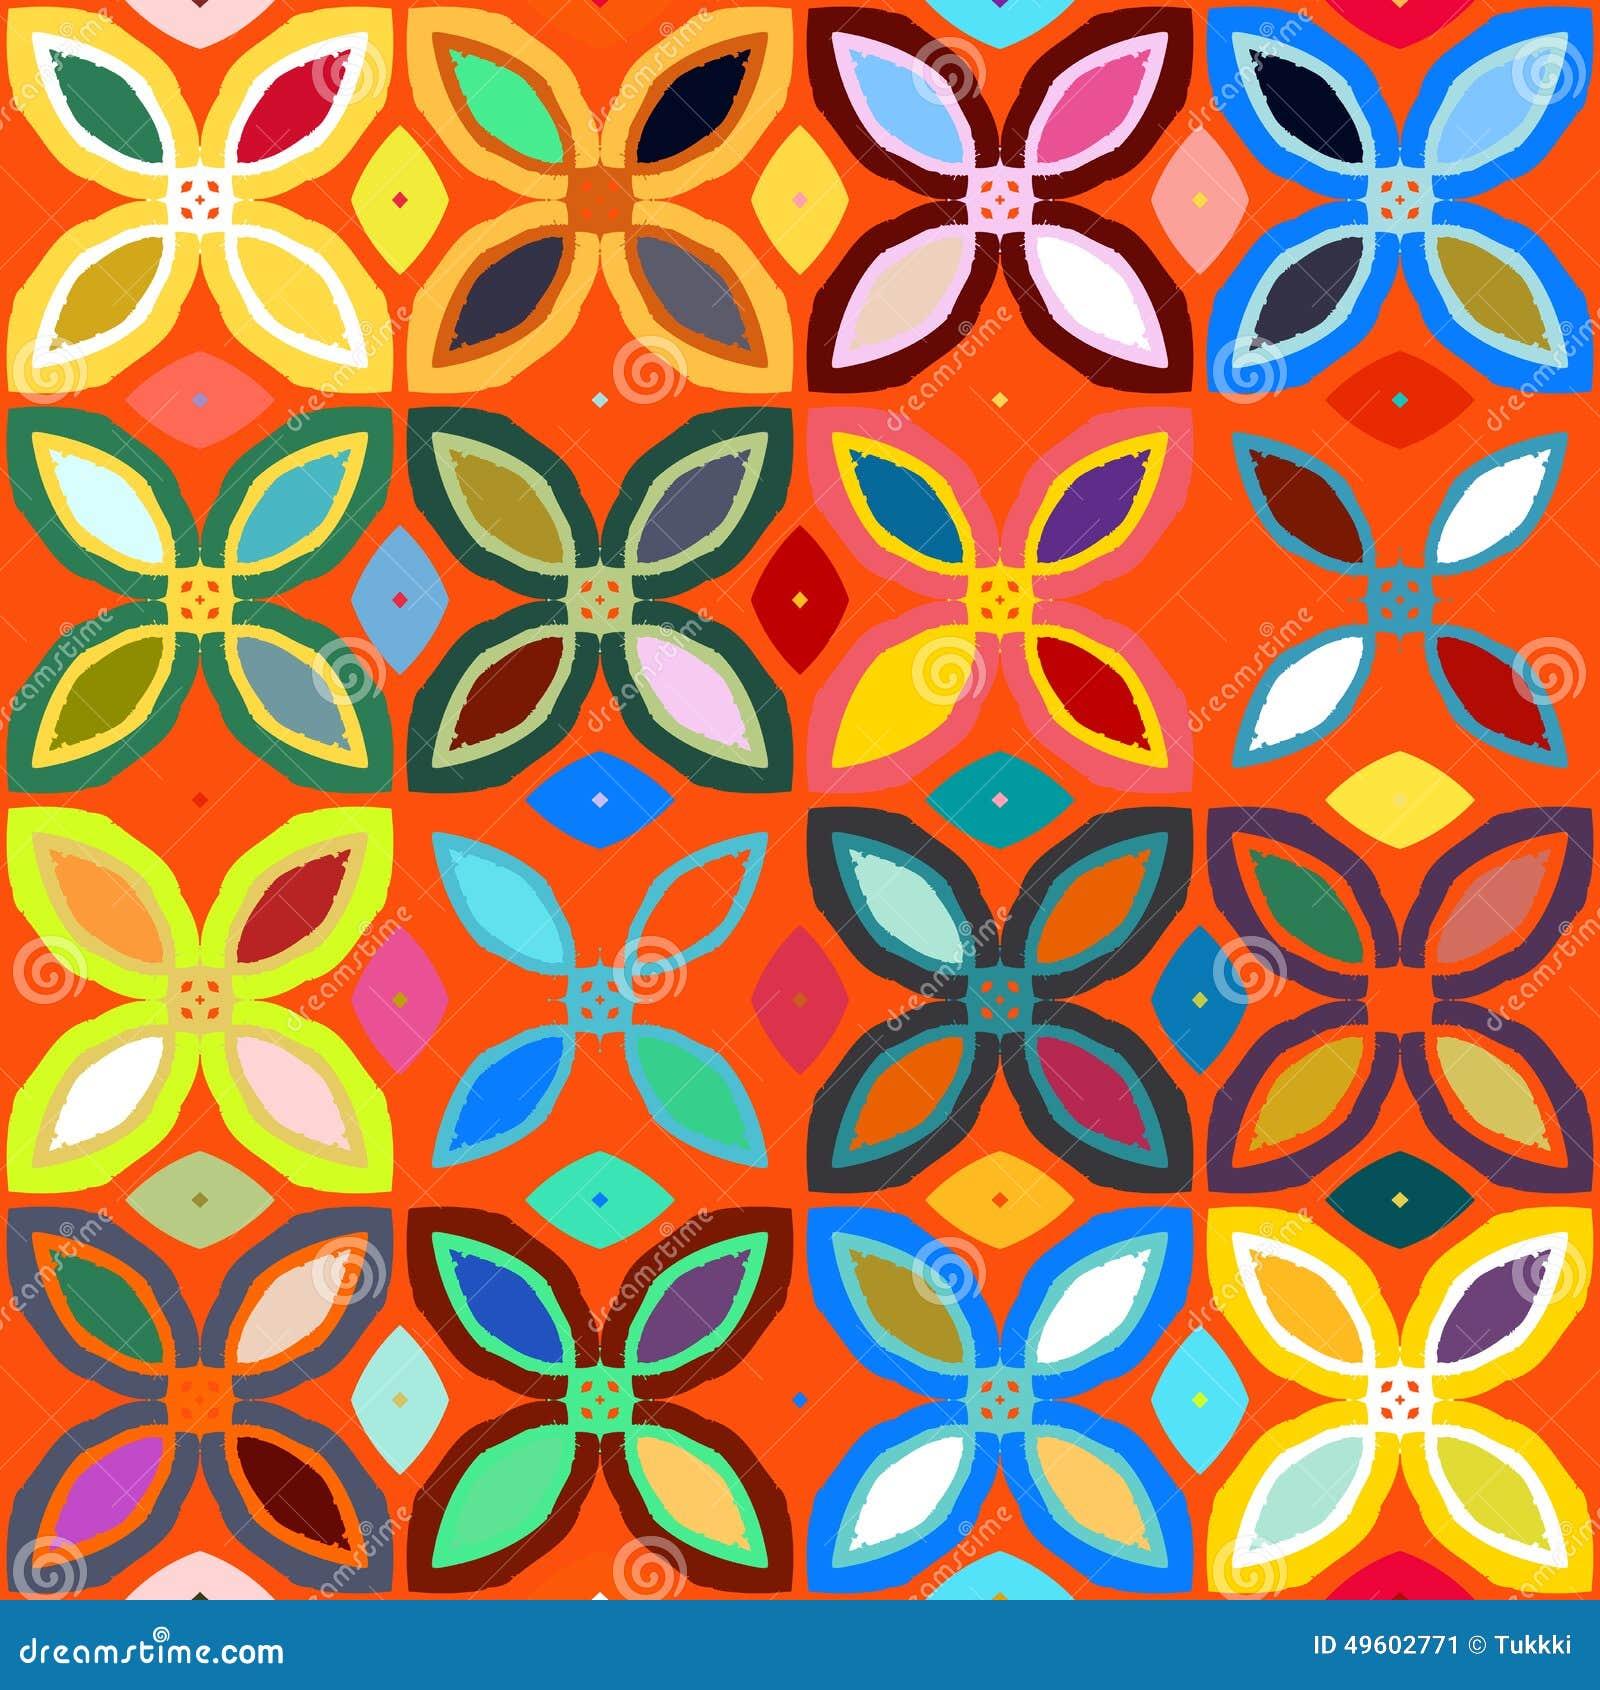 Geometric Pattern Stock Vector - Image: 49602771